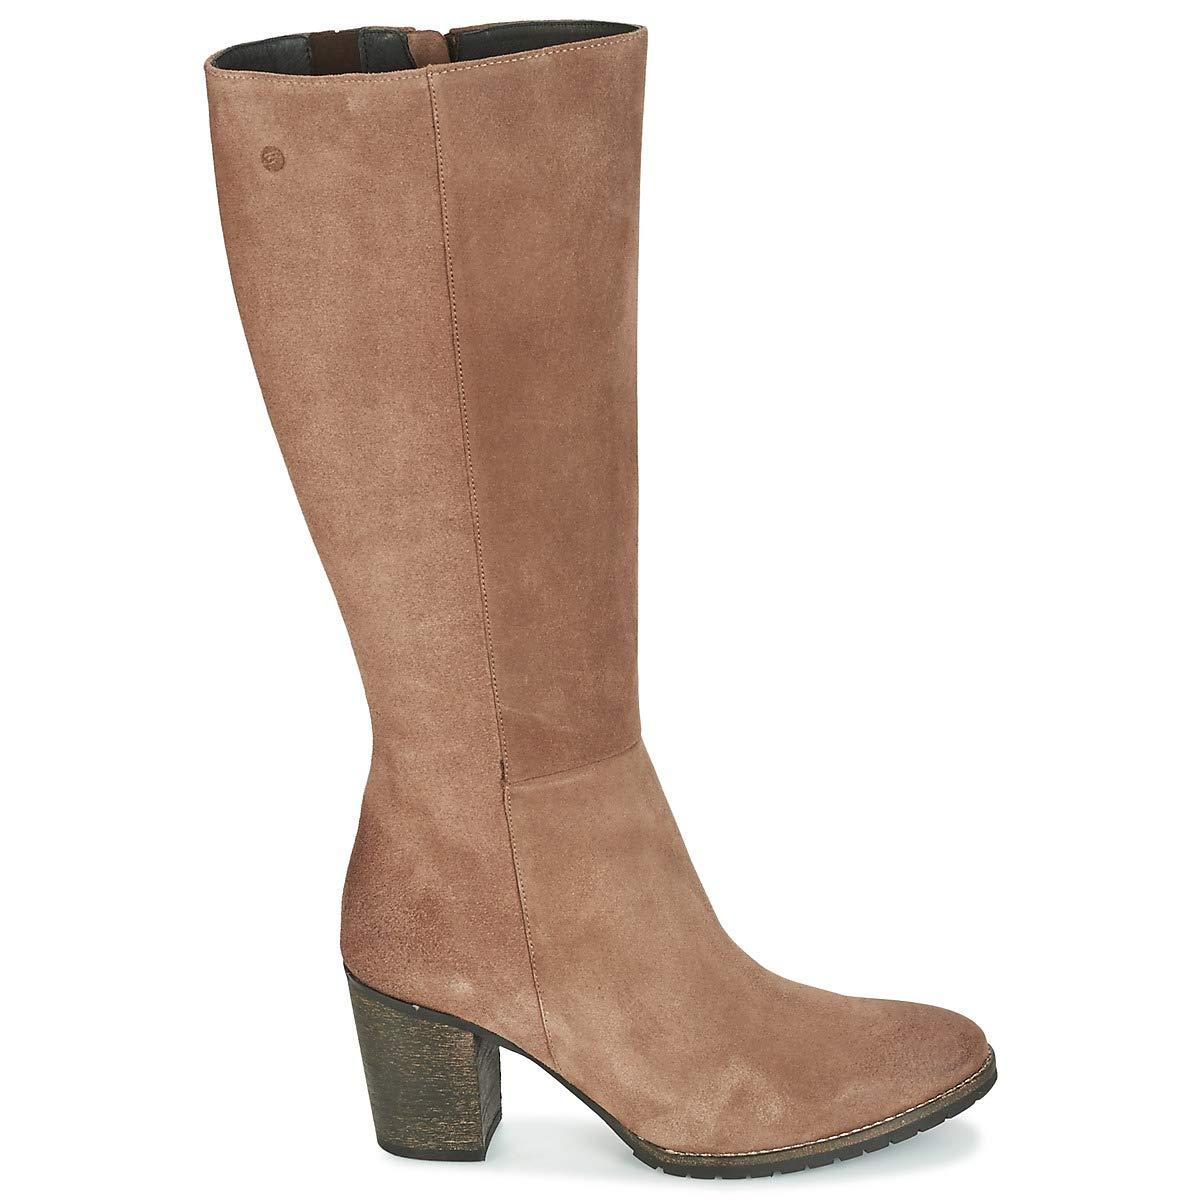 Betty London ISME ISME ISME Stiefel Damen Maulwurf Klassische Stiefel bbdf68